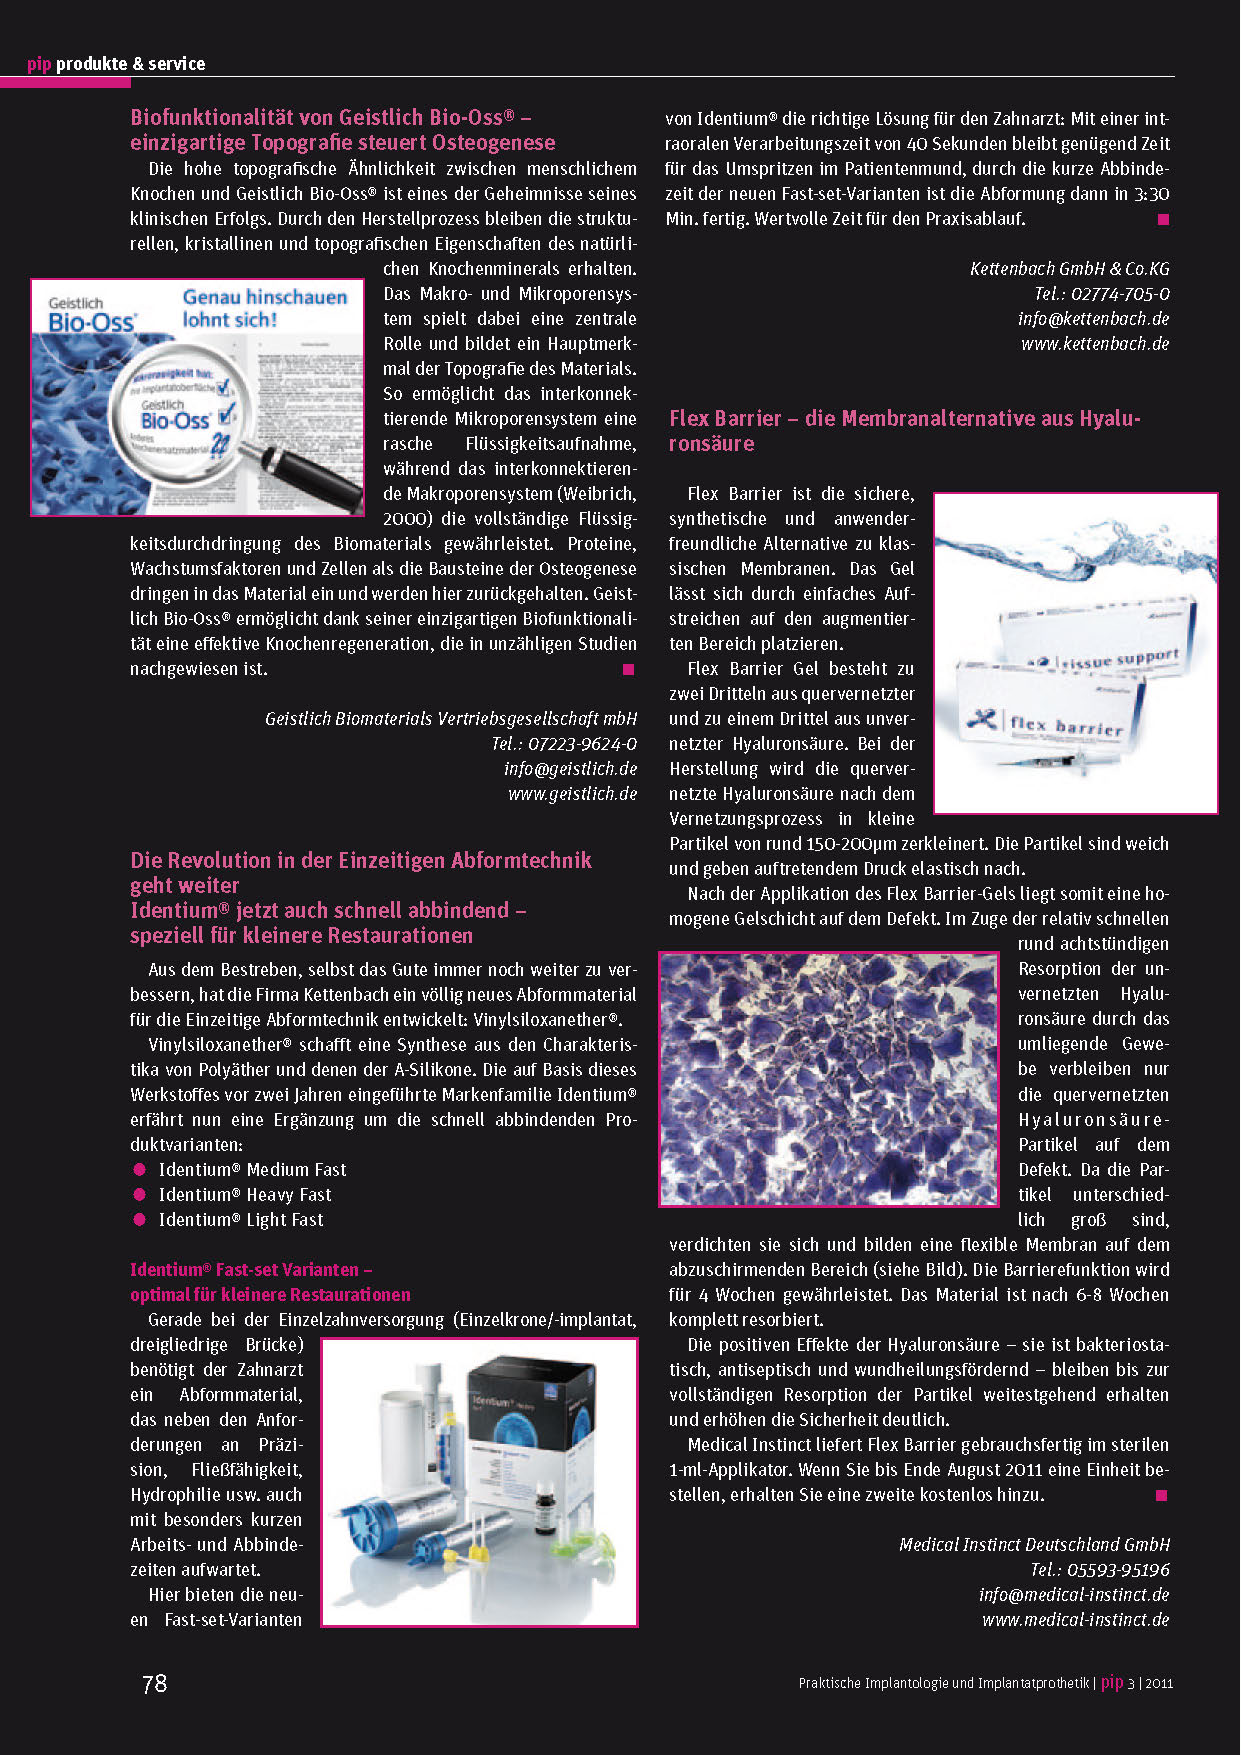 PIP - Flex Barrier – Die Membranenalternative aus Hyaluronsaeure